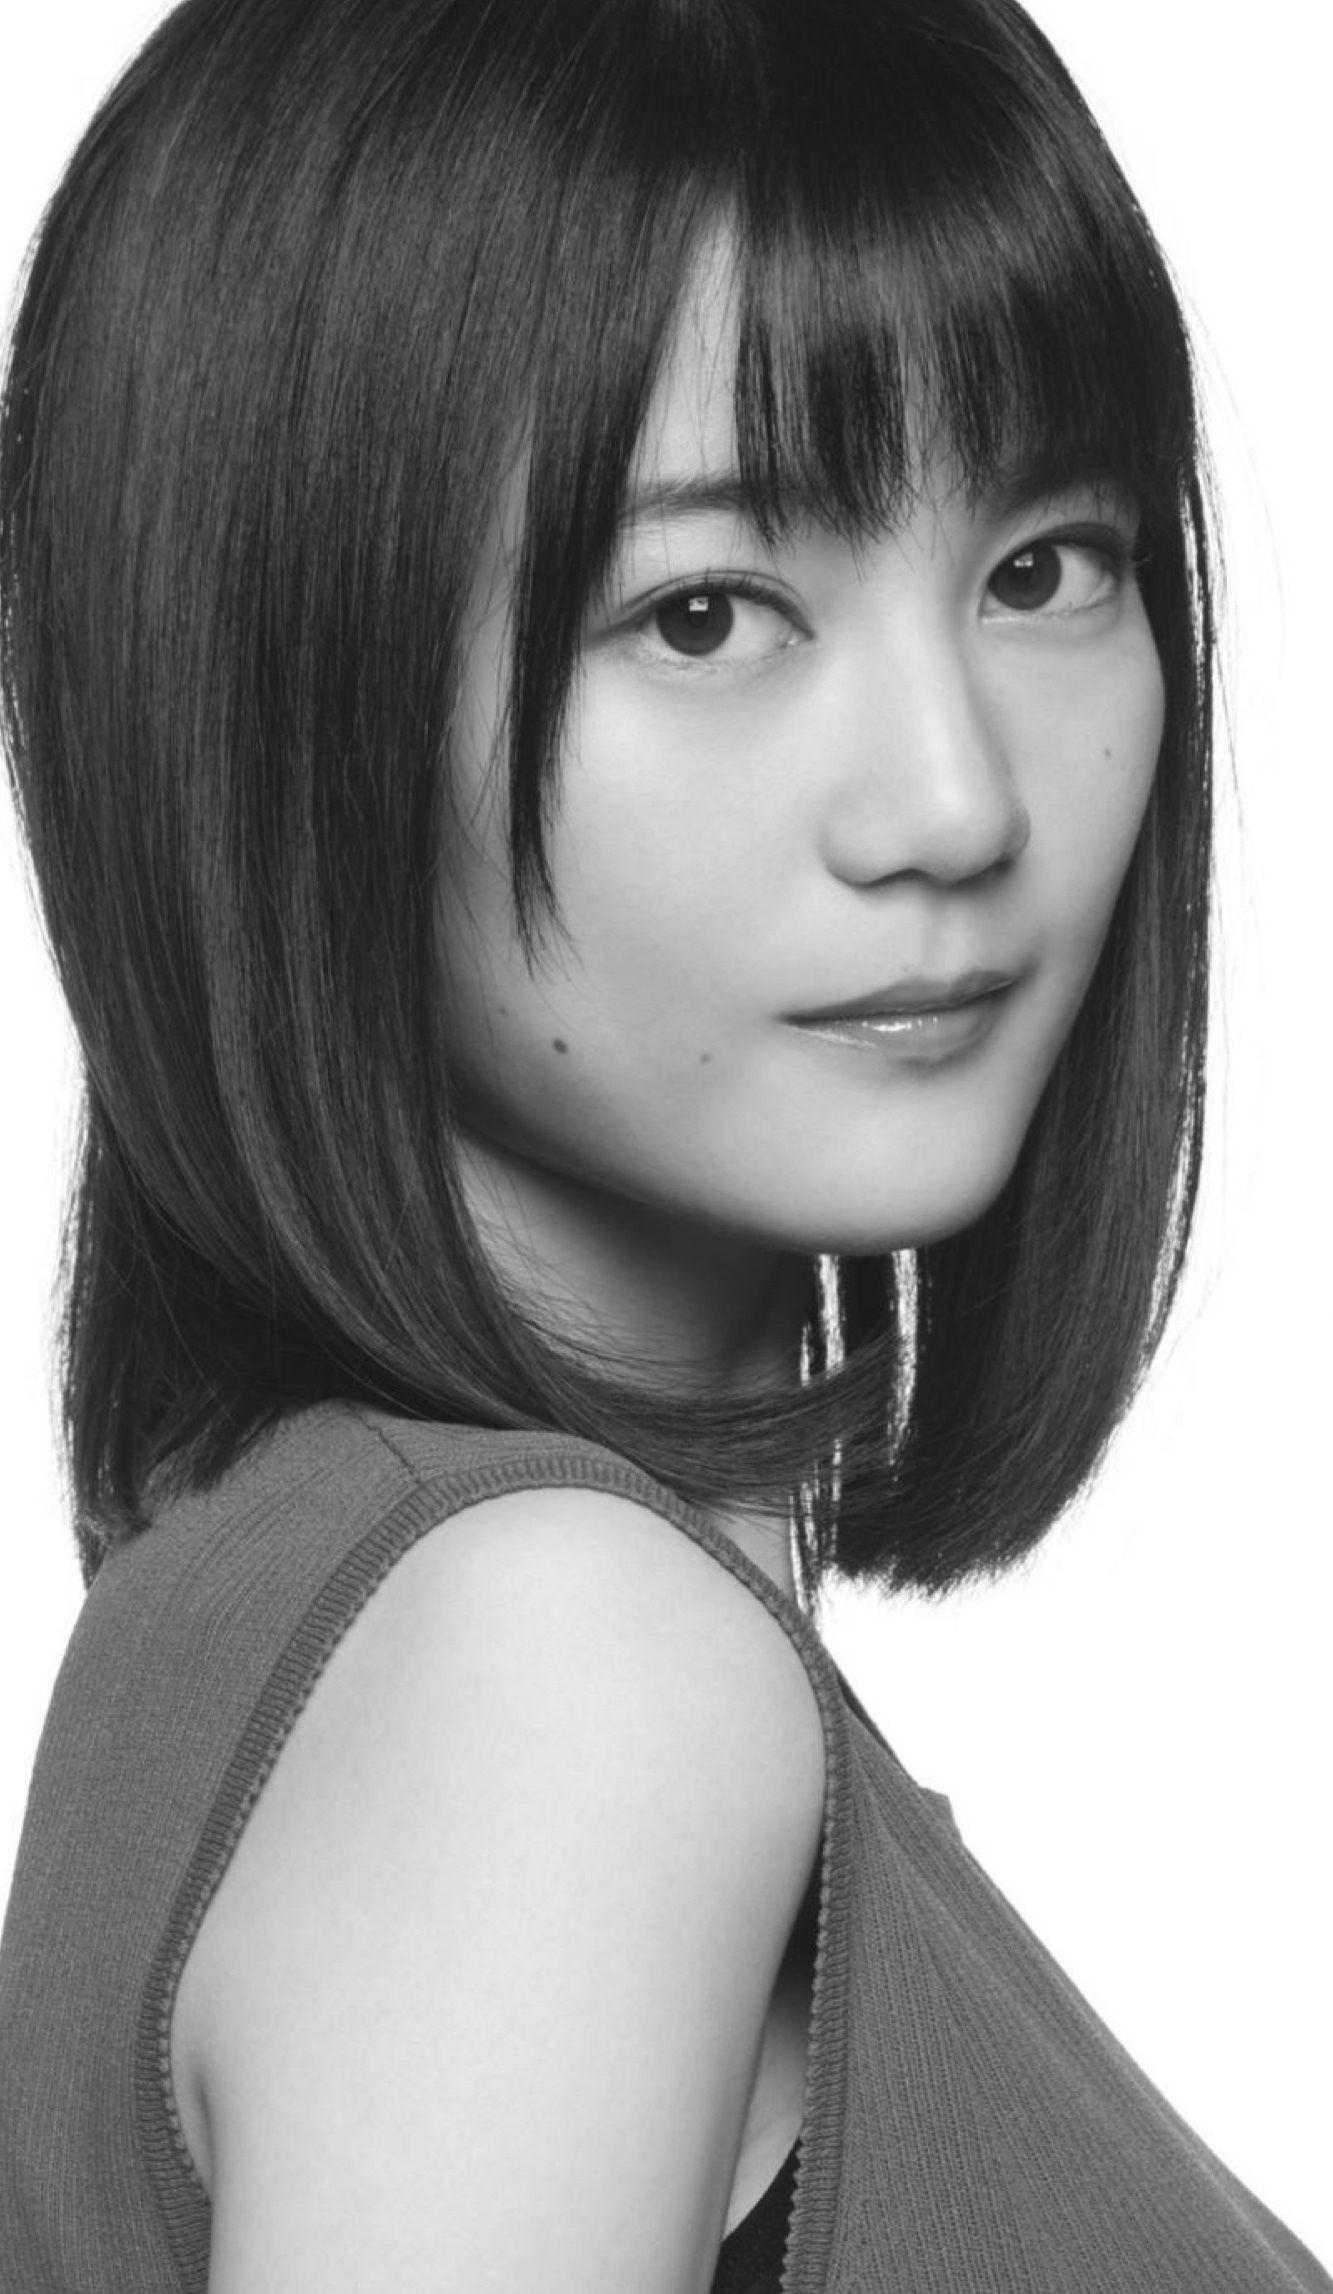 生田絵梨花の画像 p1_37